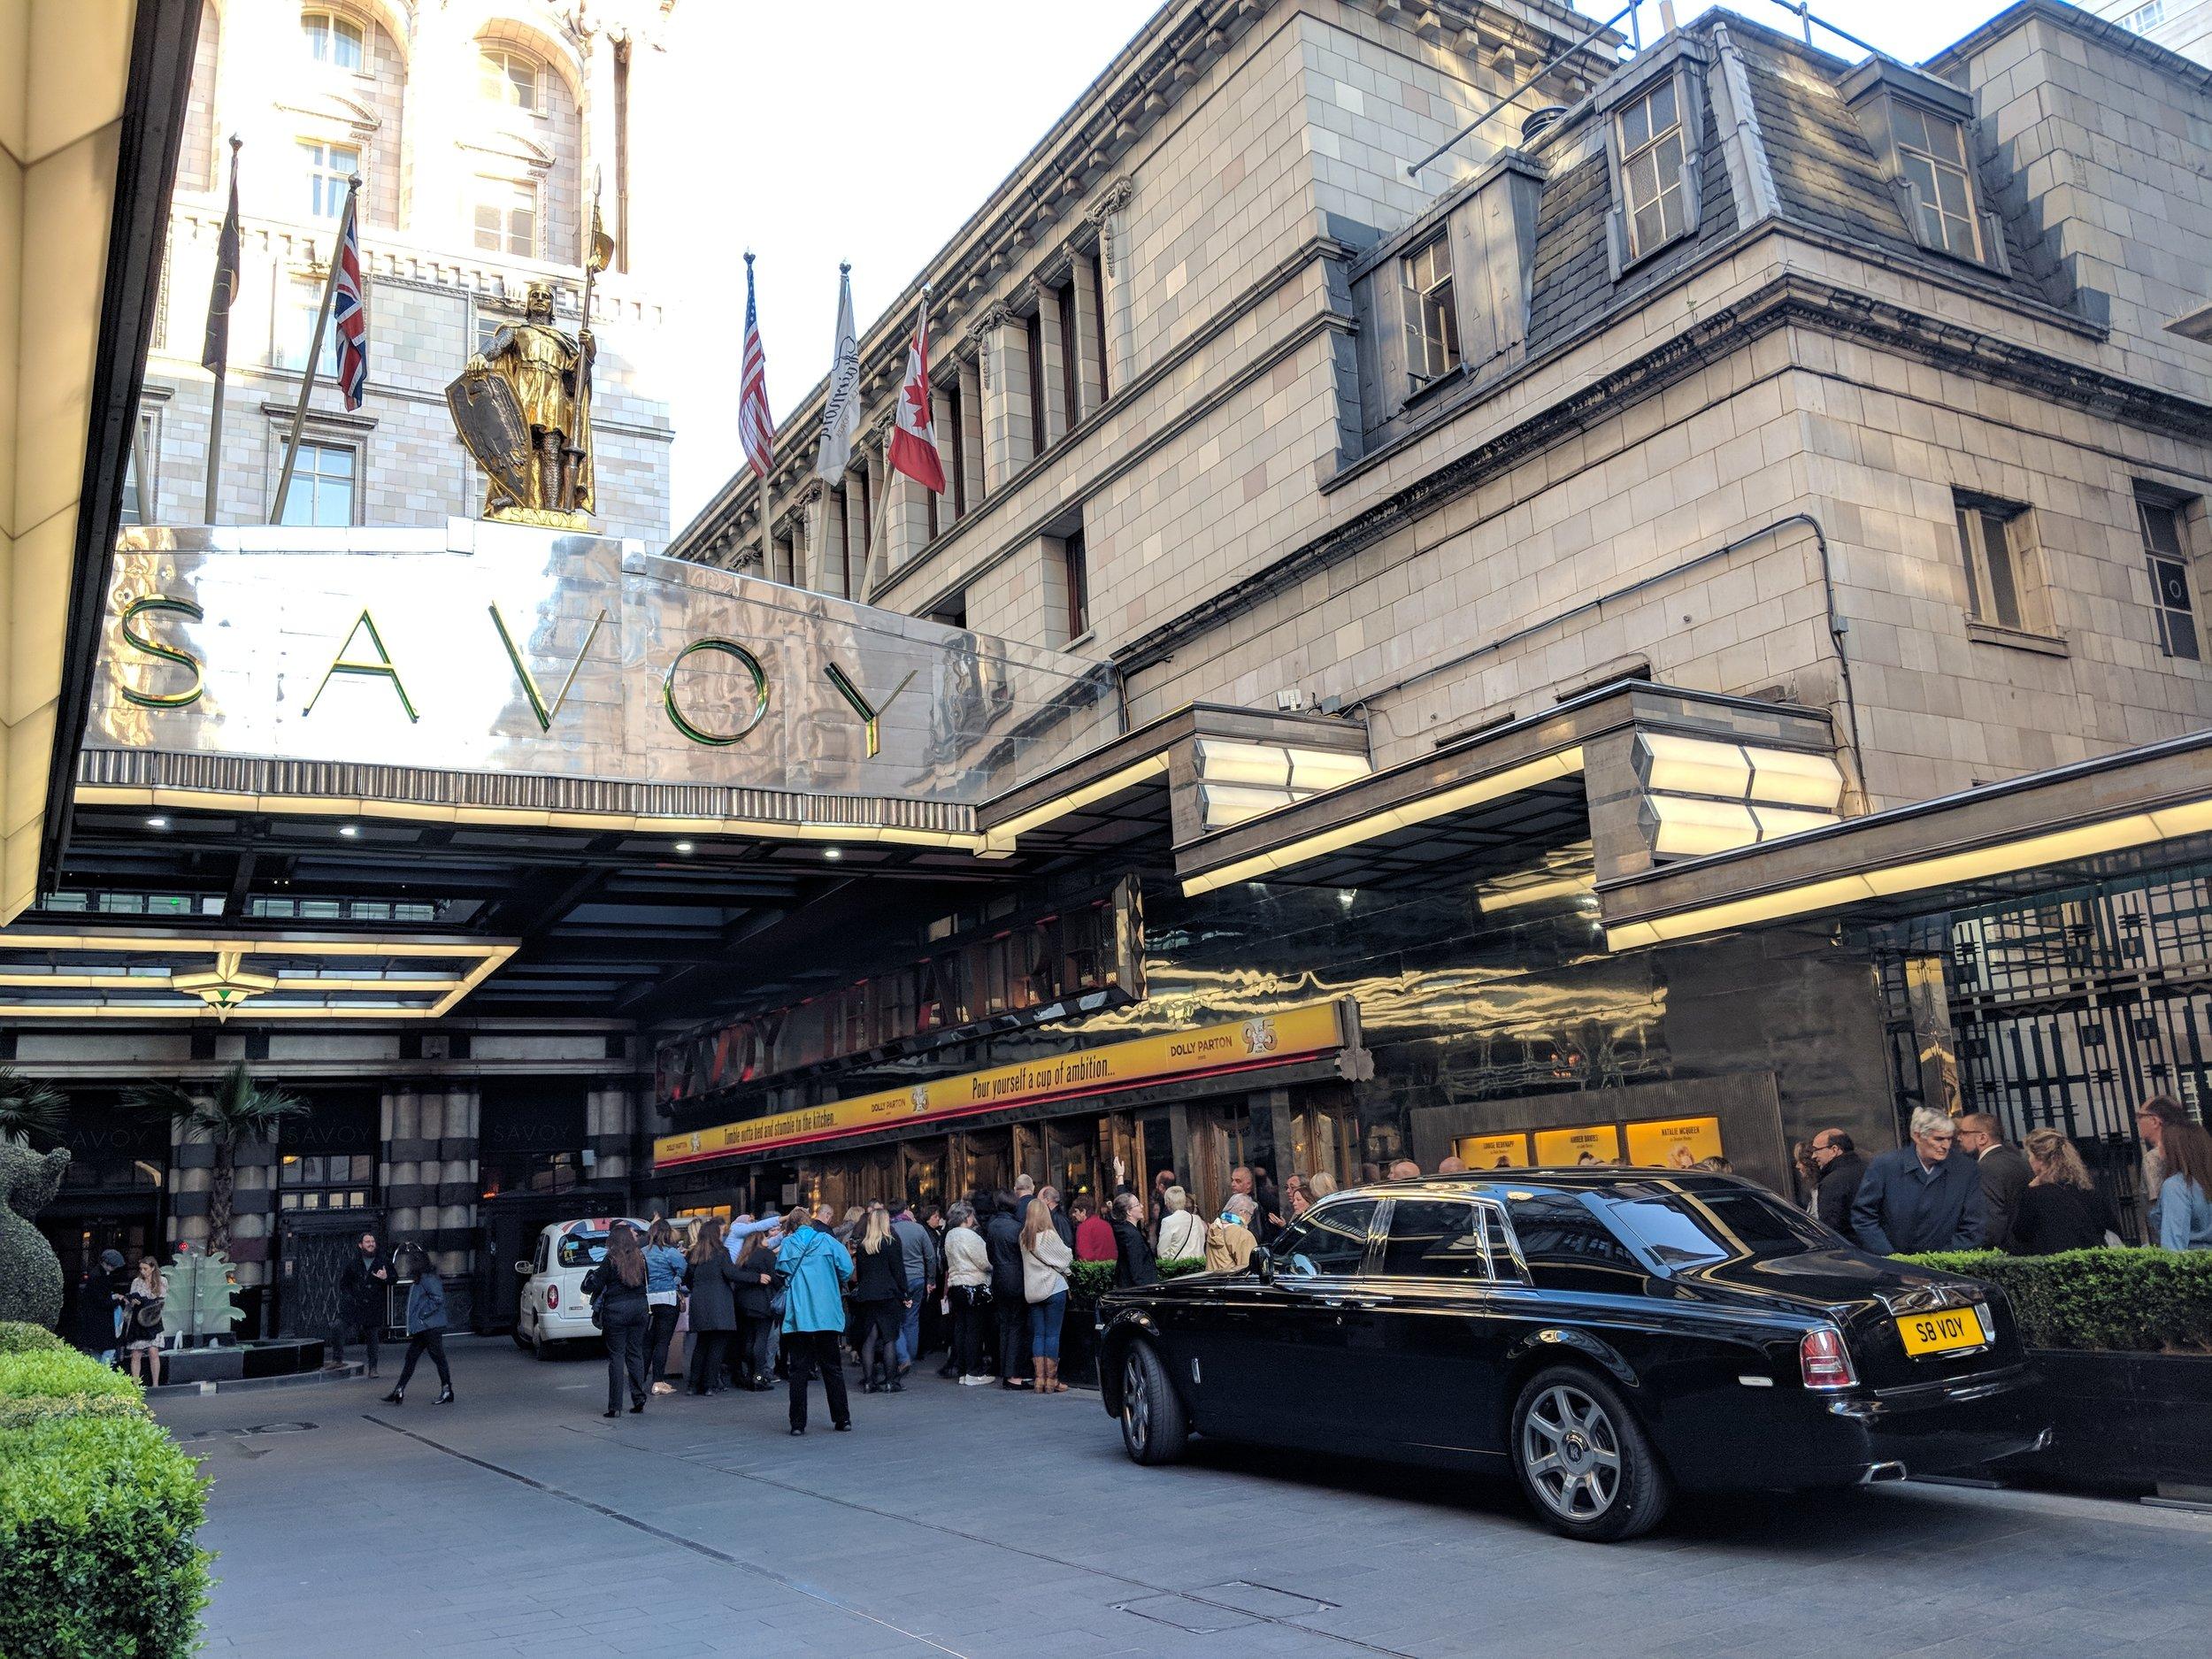 Savoy Theatre - visited 10/05/2019